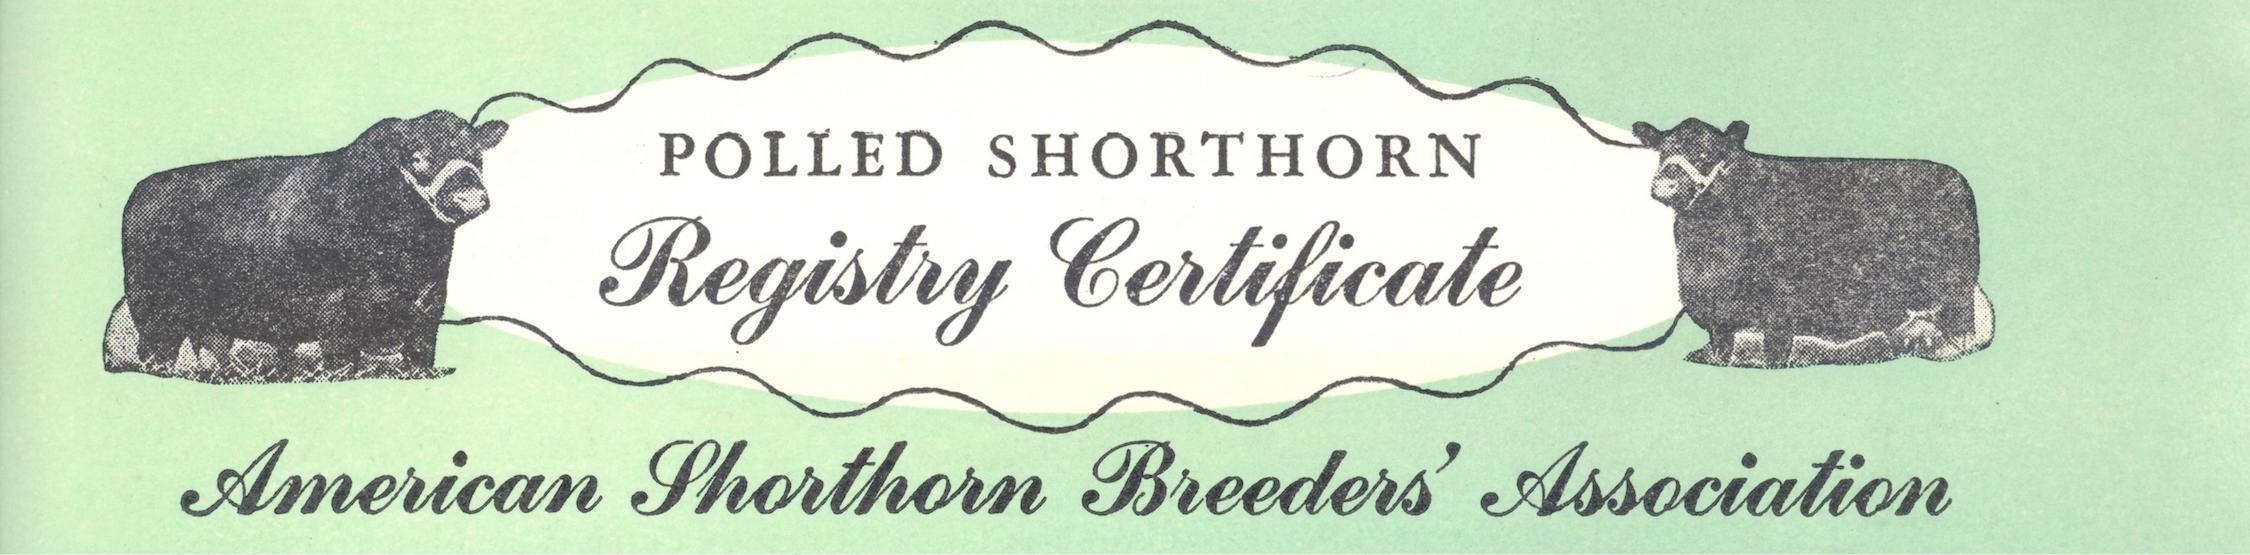 Polled Shorthorn Registration Certificate (top).jpg